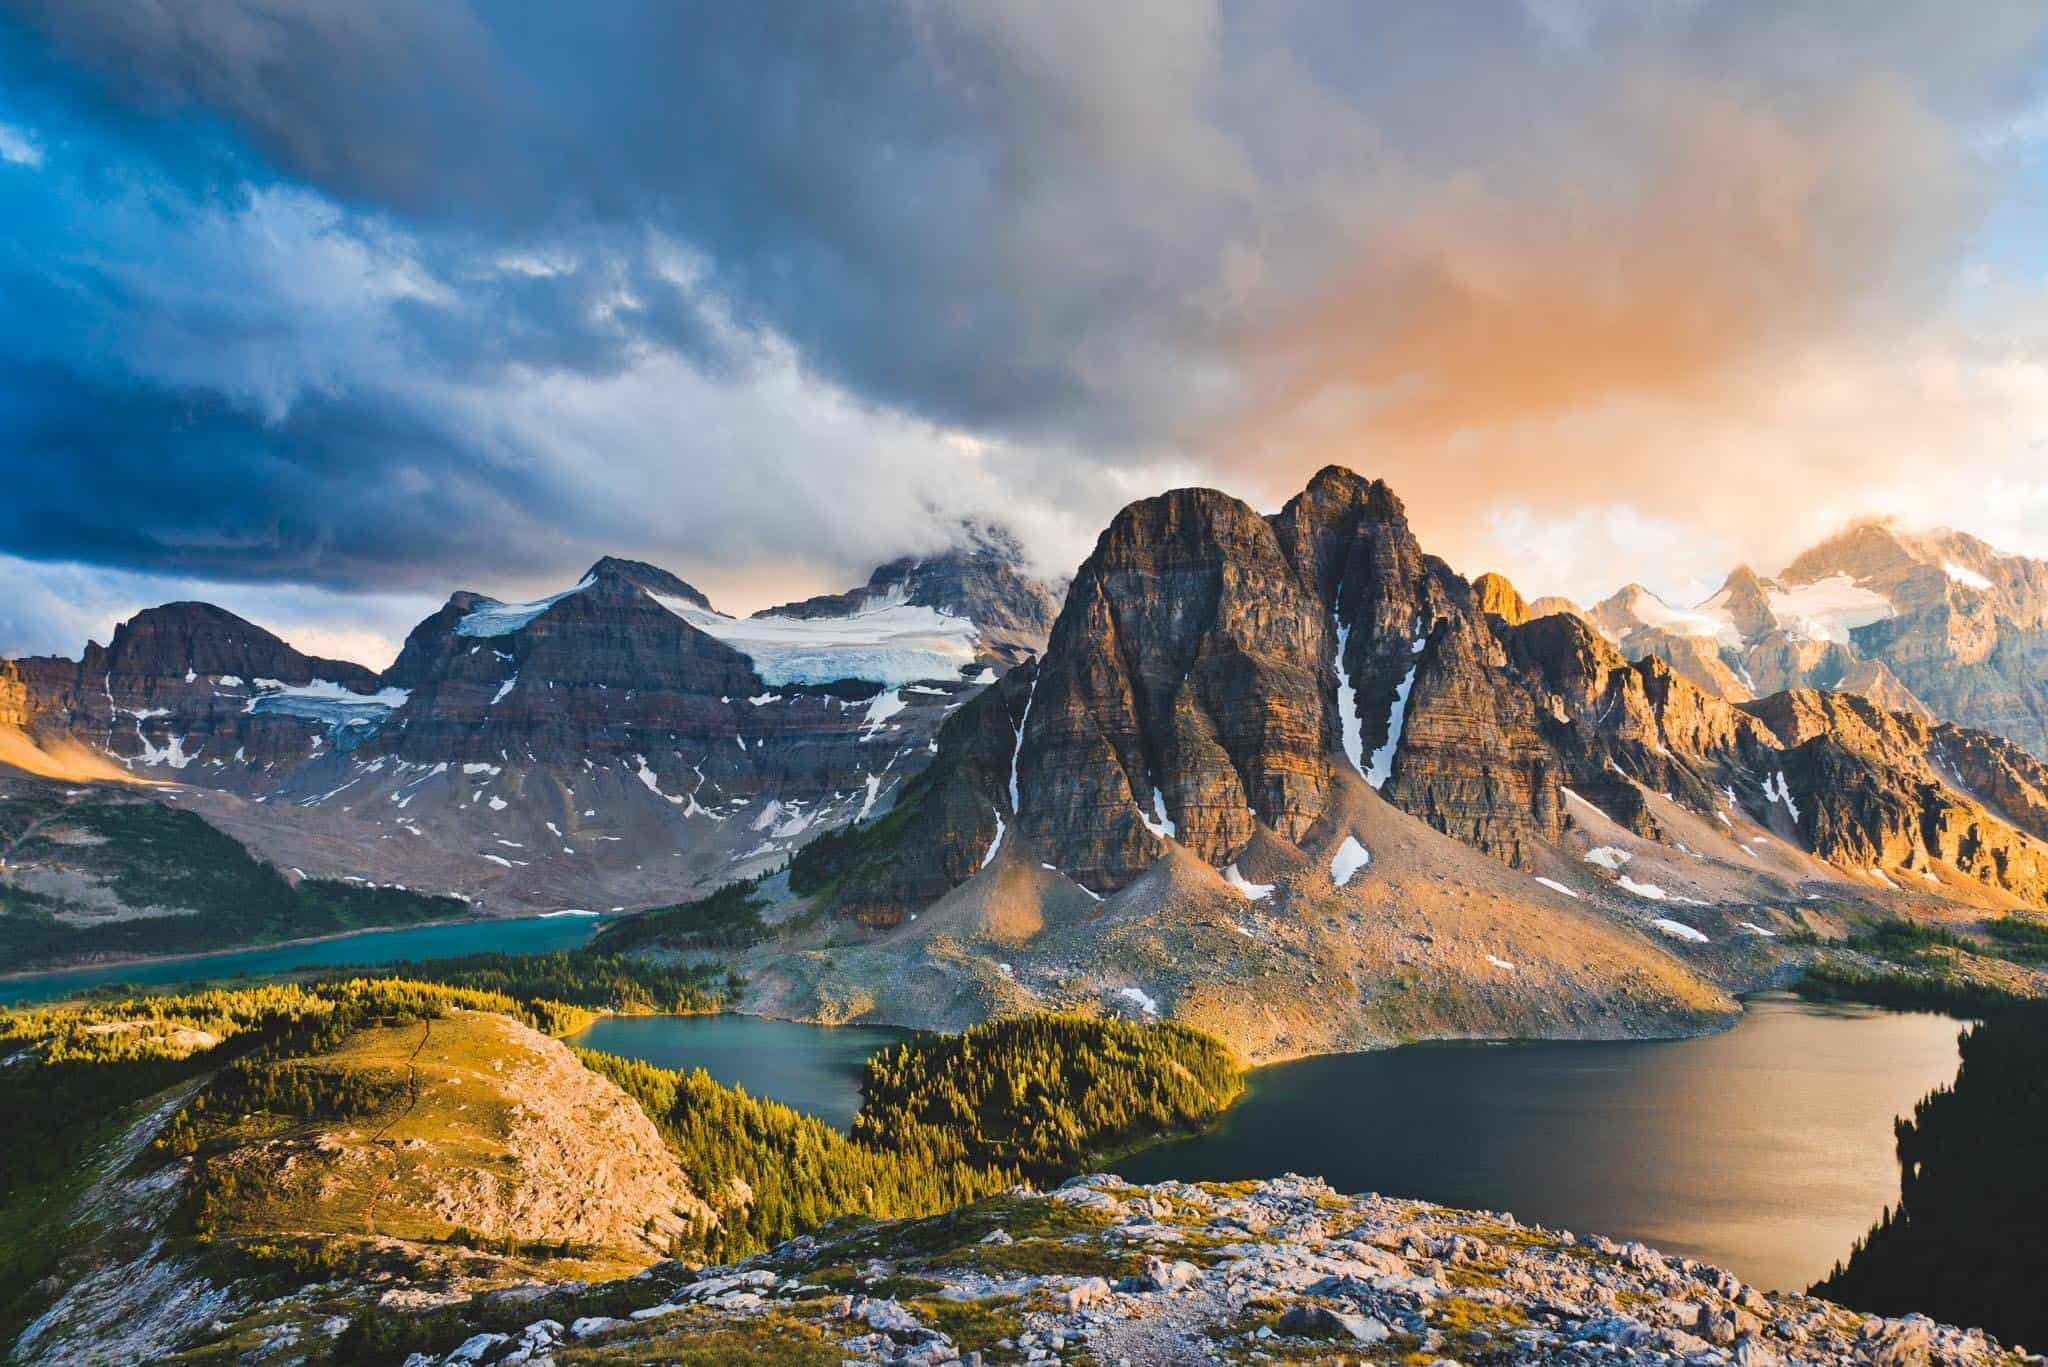 epic mountain nature contest worldscapes sceneries giants canadian amazing viewbug celestine aerden win bucket assiniboine mount onward winner landscape unforgettable